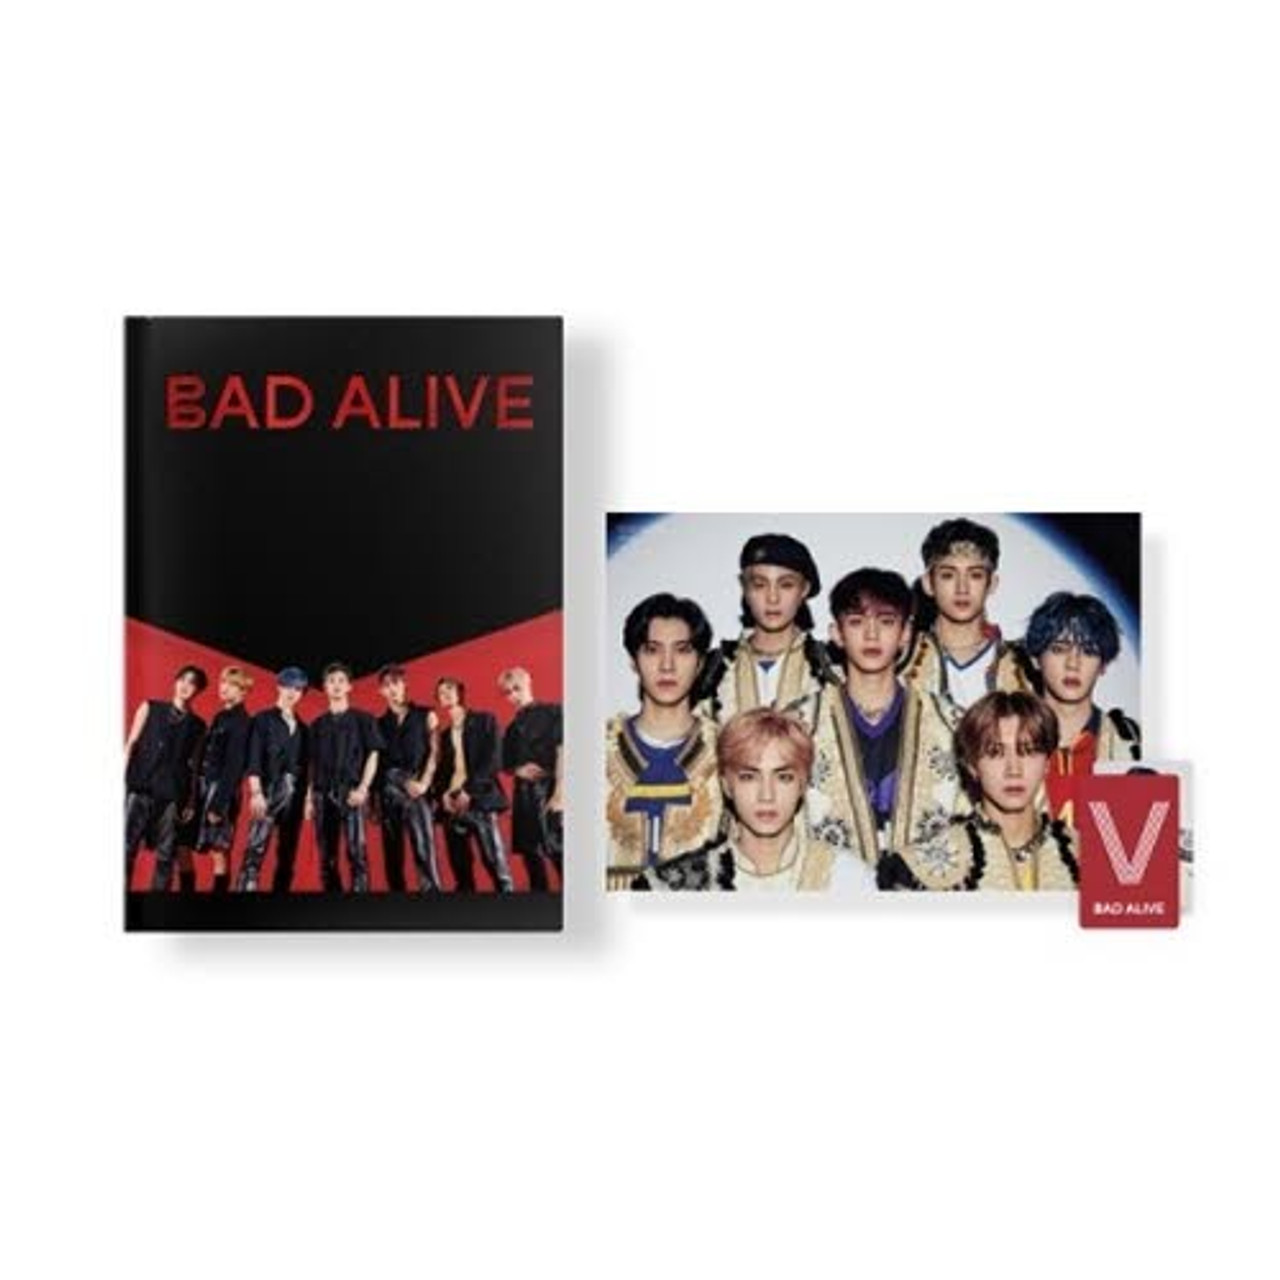 WayV PHOTO STORY BOOK [Bad Alive] STORY BOOK [Bad Alive]